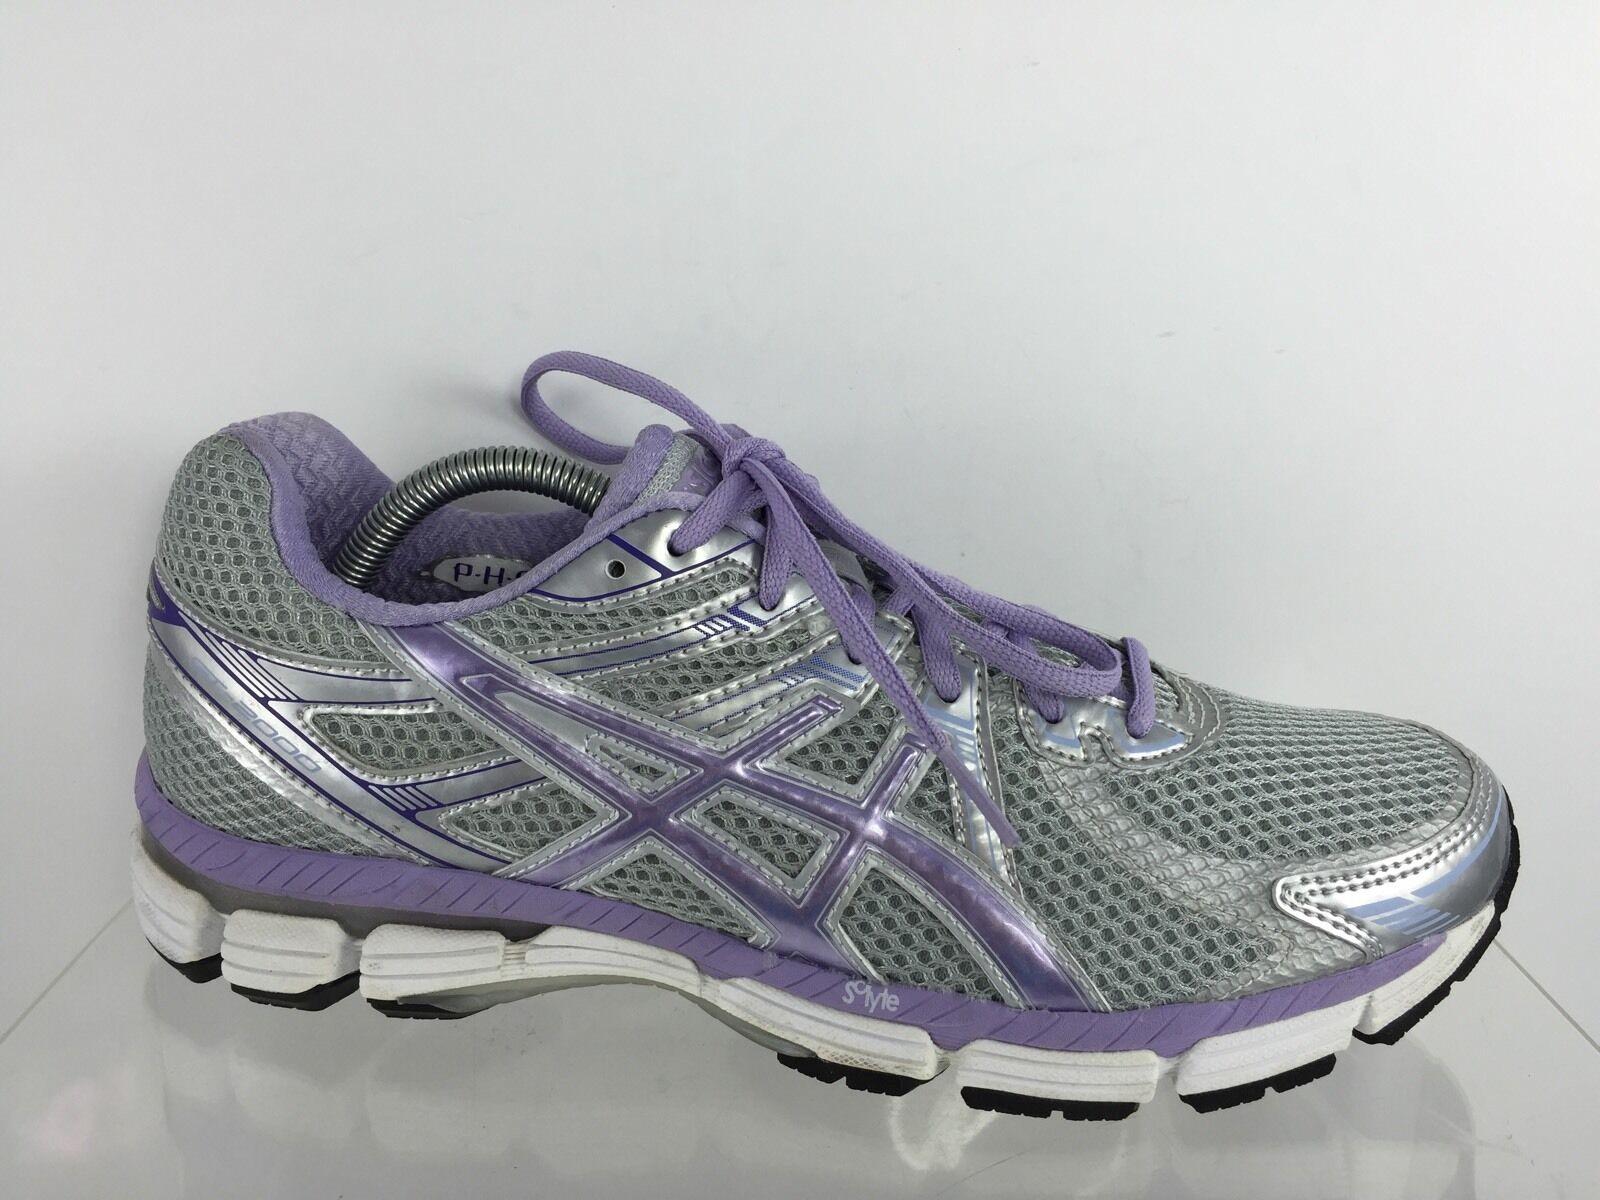 Asics Damenschuhe Gray/Multi Farbe Schuhes Athletic Schuhes Farbe 11 94313d